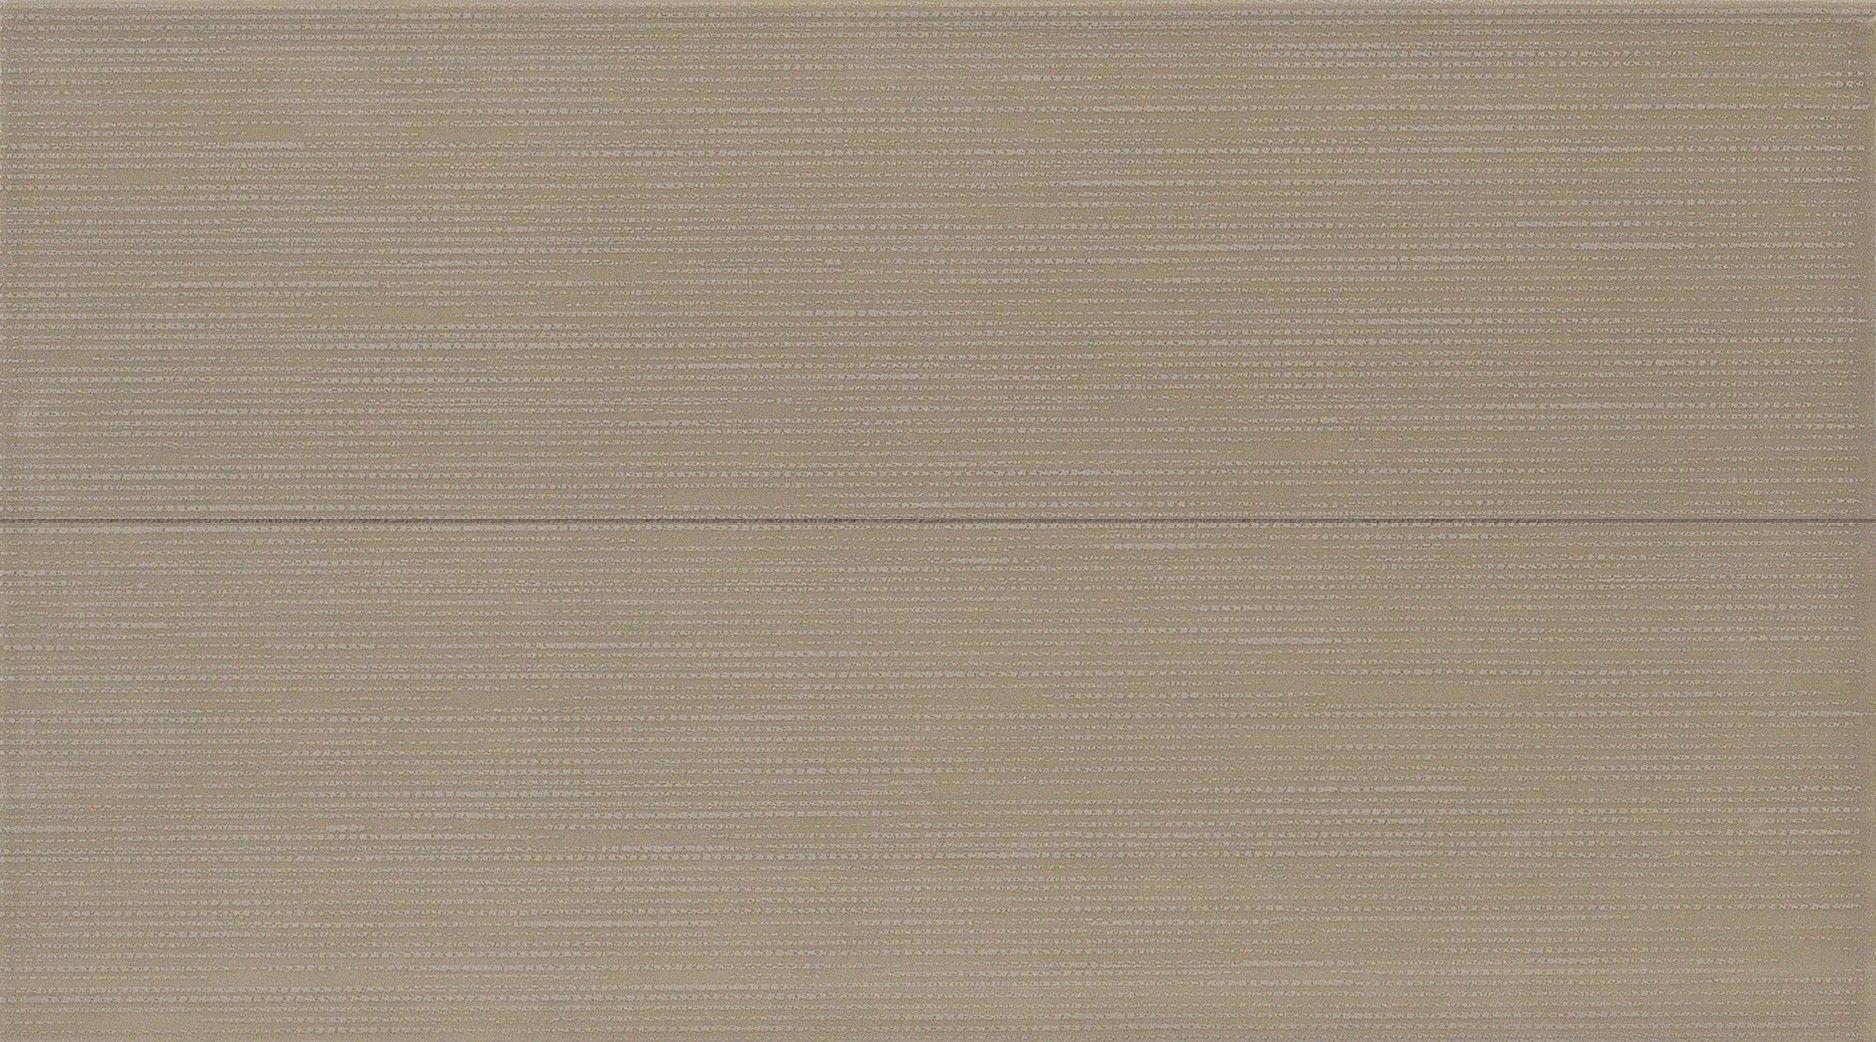 Dado #l2 verve tortora 25x45 cm 302656 #gres #decorati #25x45 su